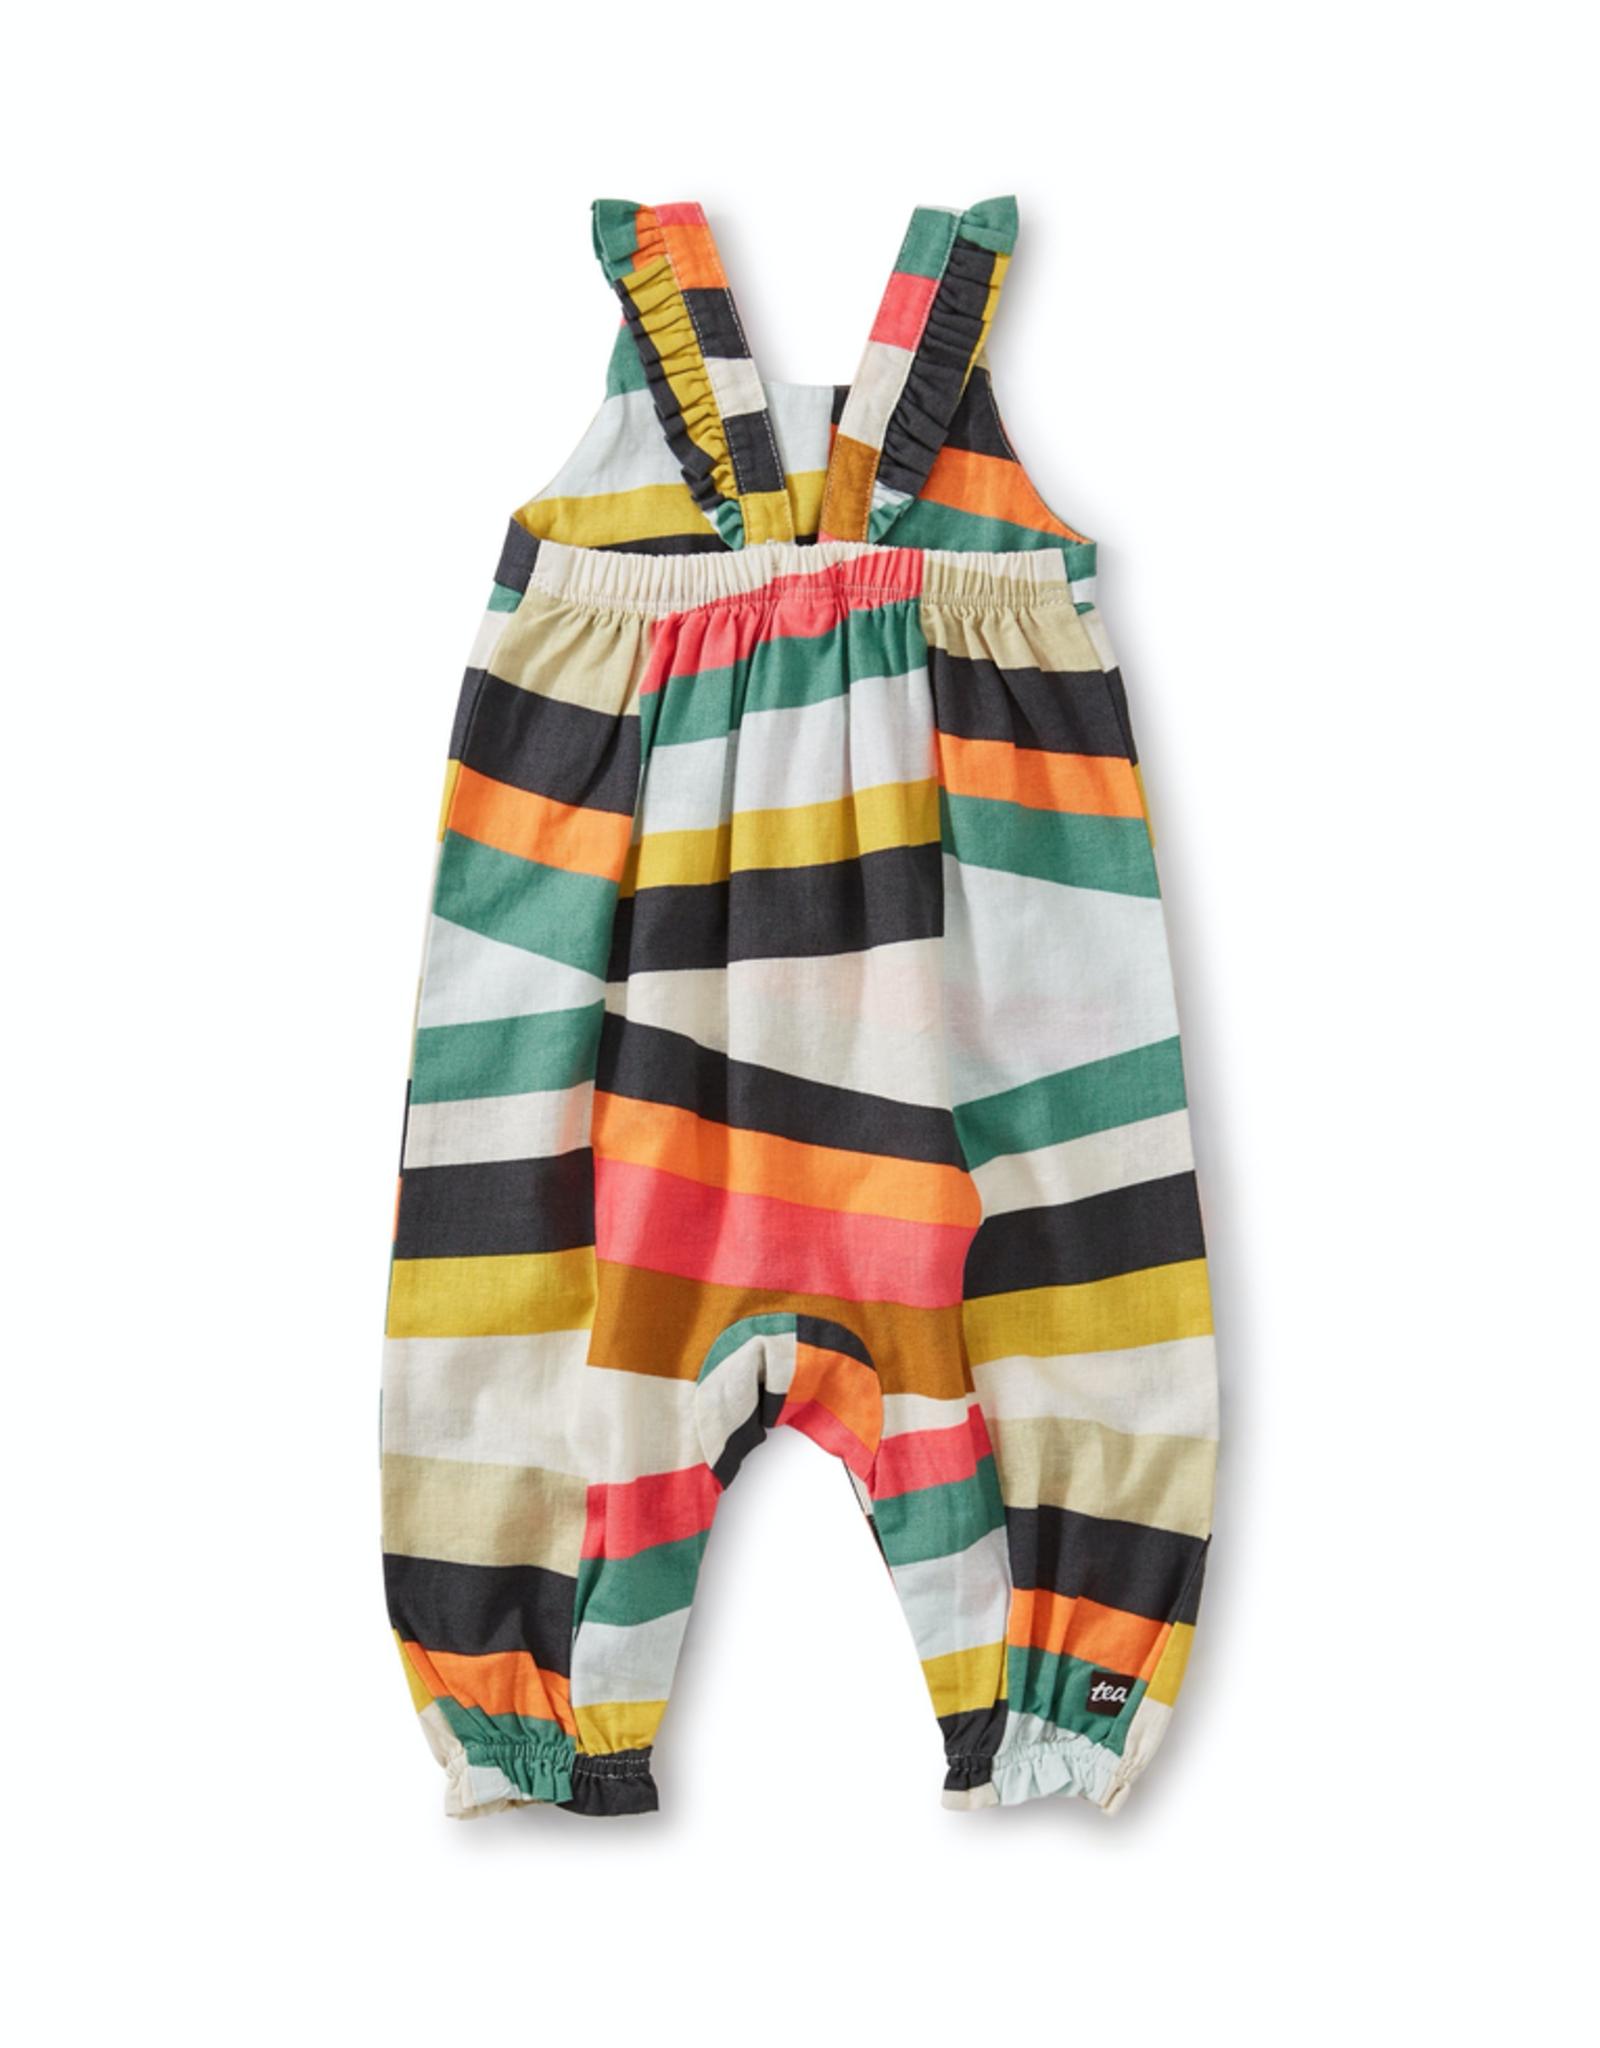 Tea Collection Tie Shoulder Romper for Baby Girl in Oasis Fruit